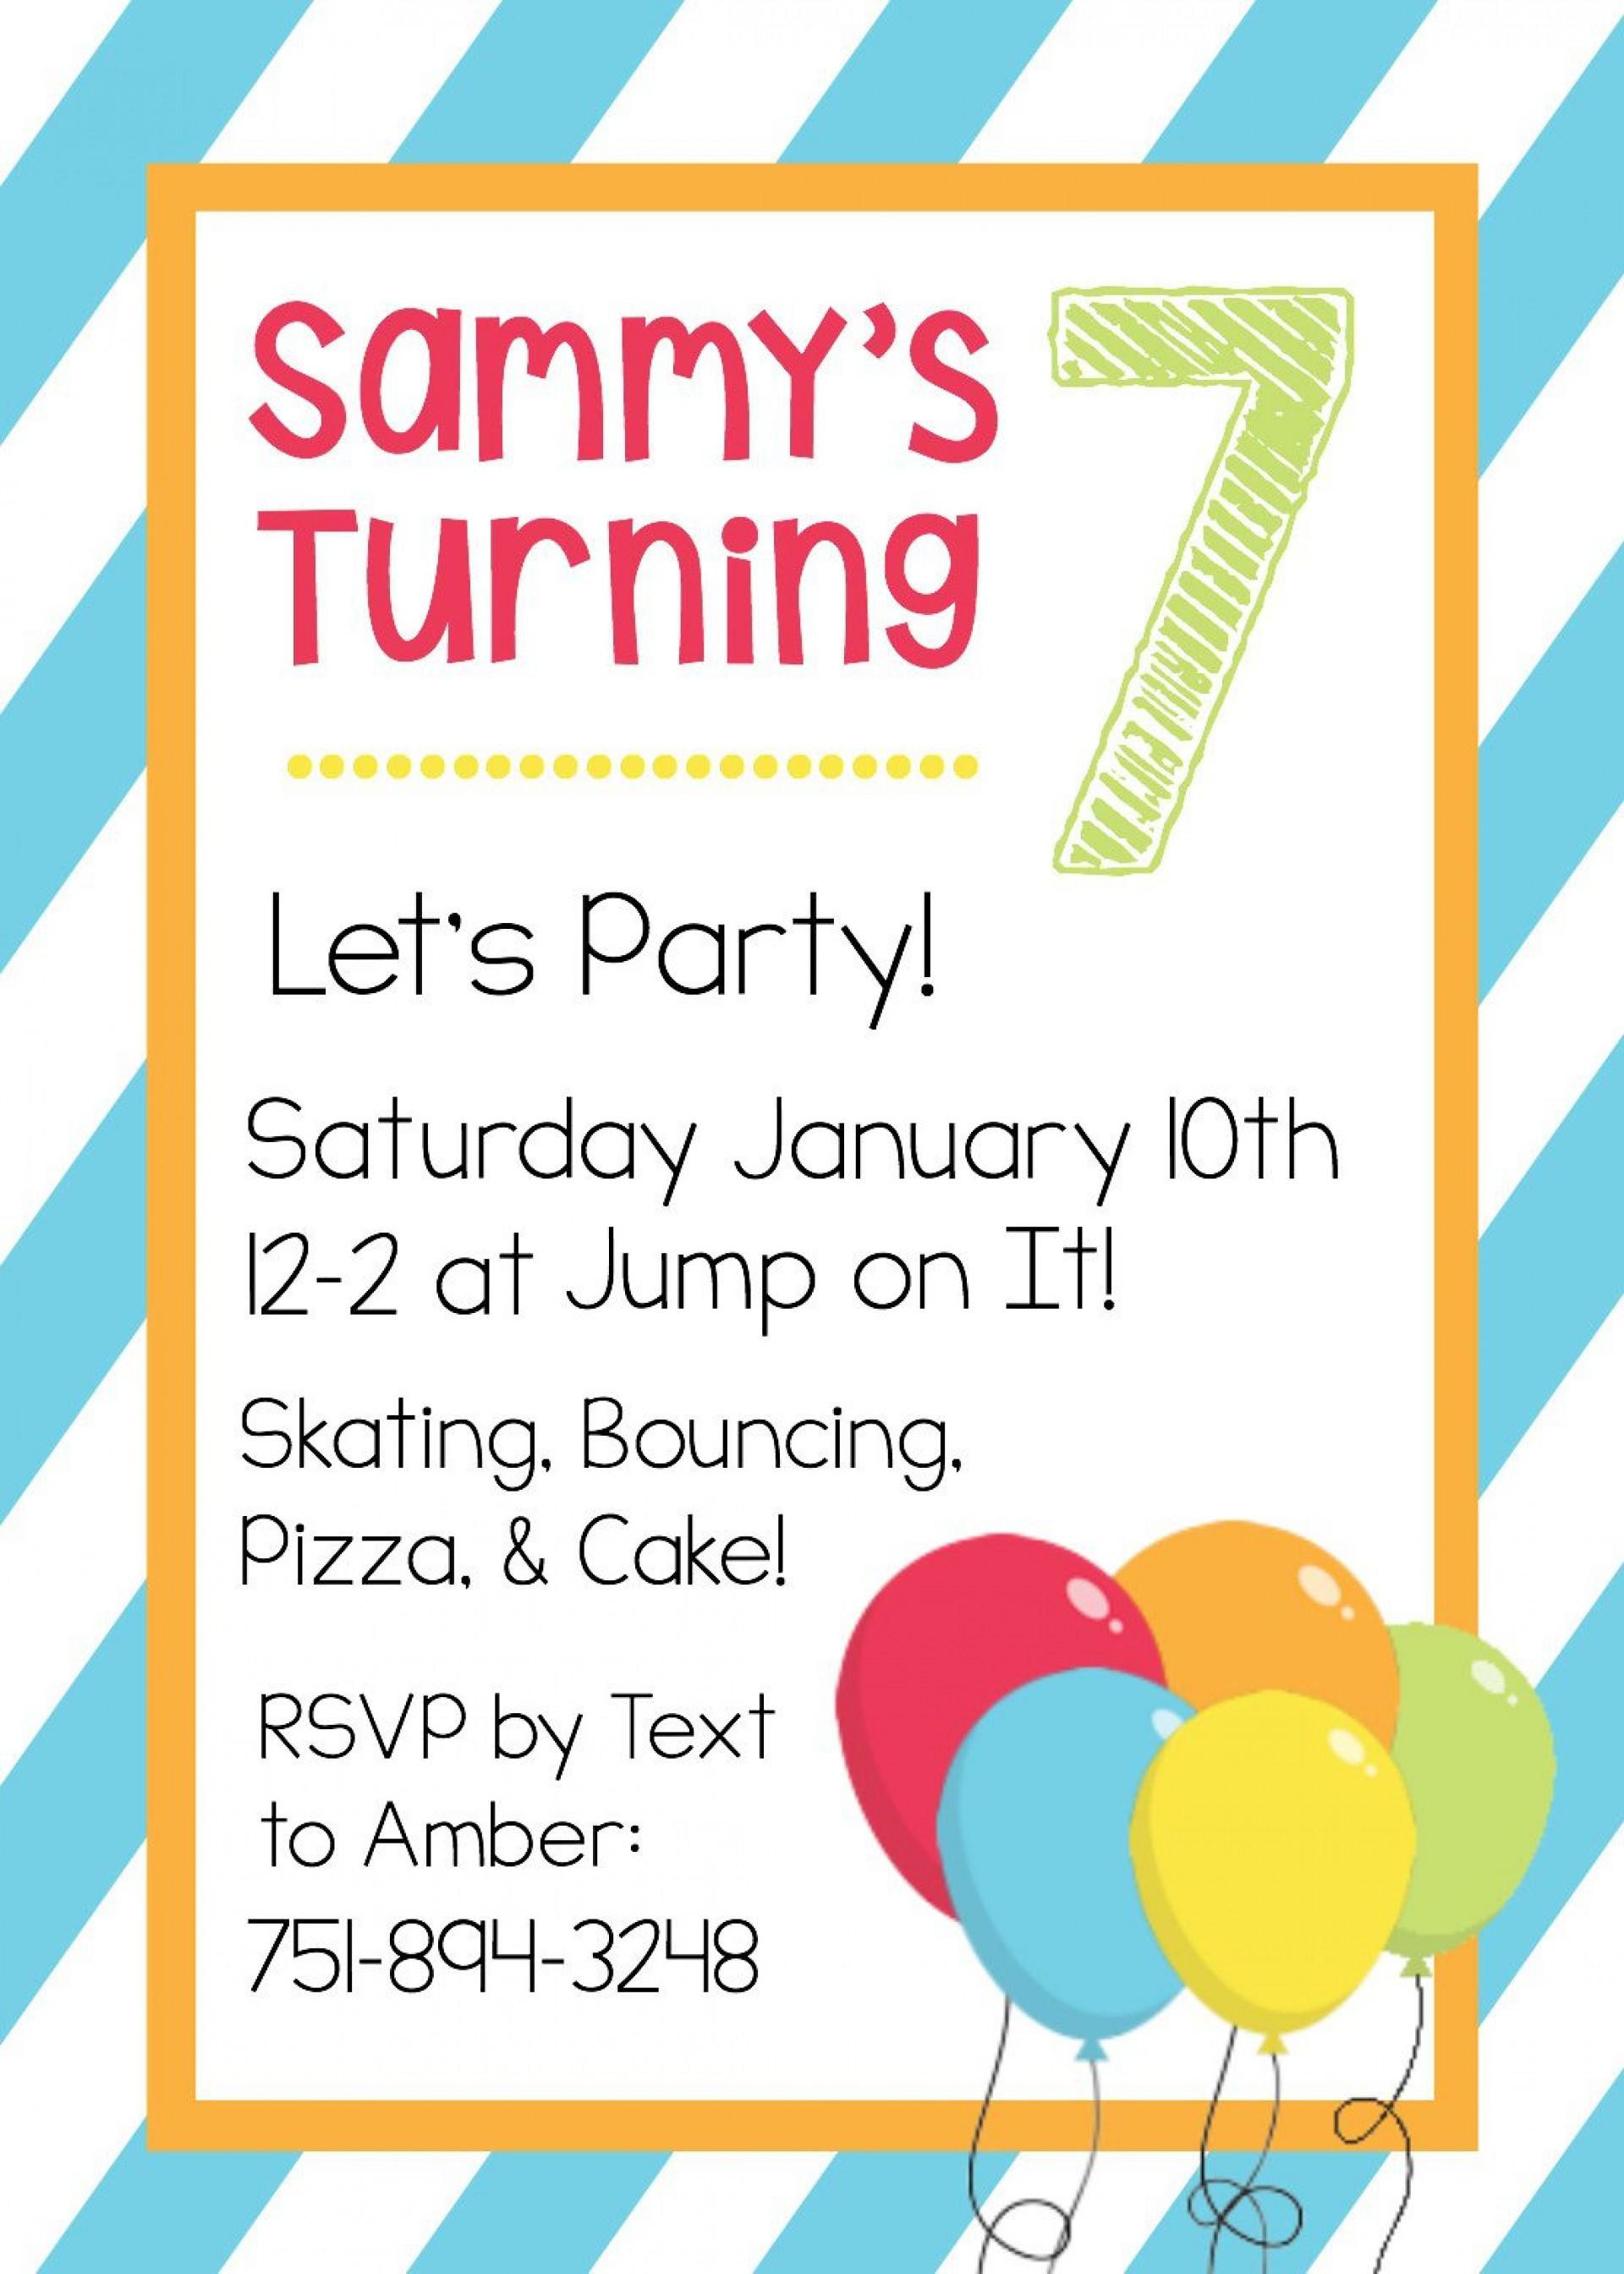 005 Imposing Free Birthday Party Invitation Template Design  Templates Printable 16th Australia Uk1920